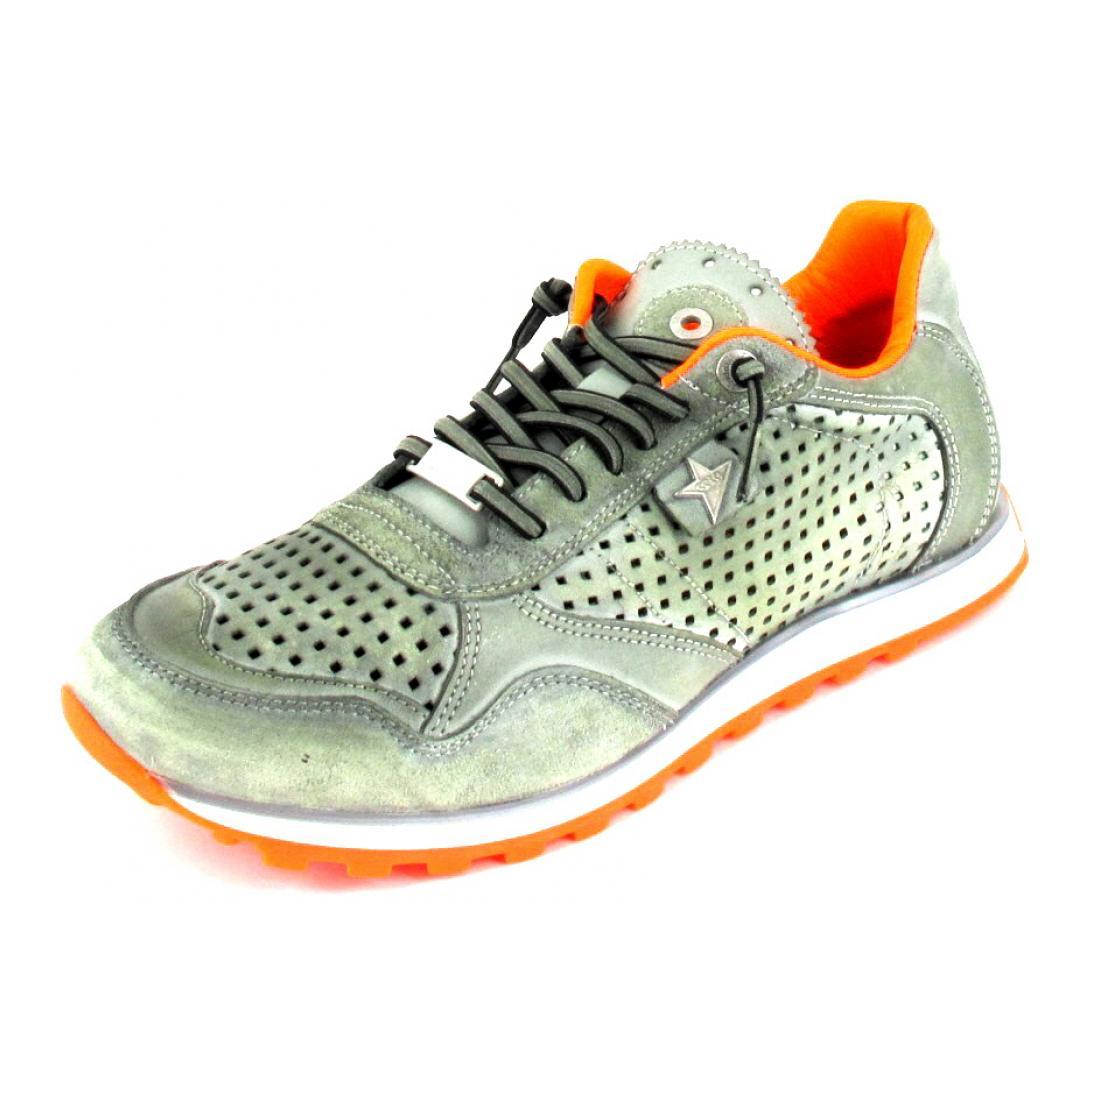 Cetti Sneaker kombat orange